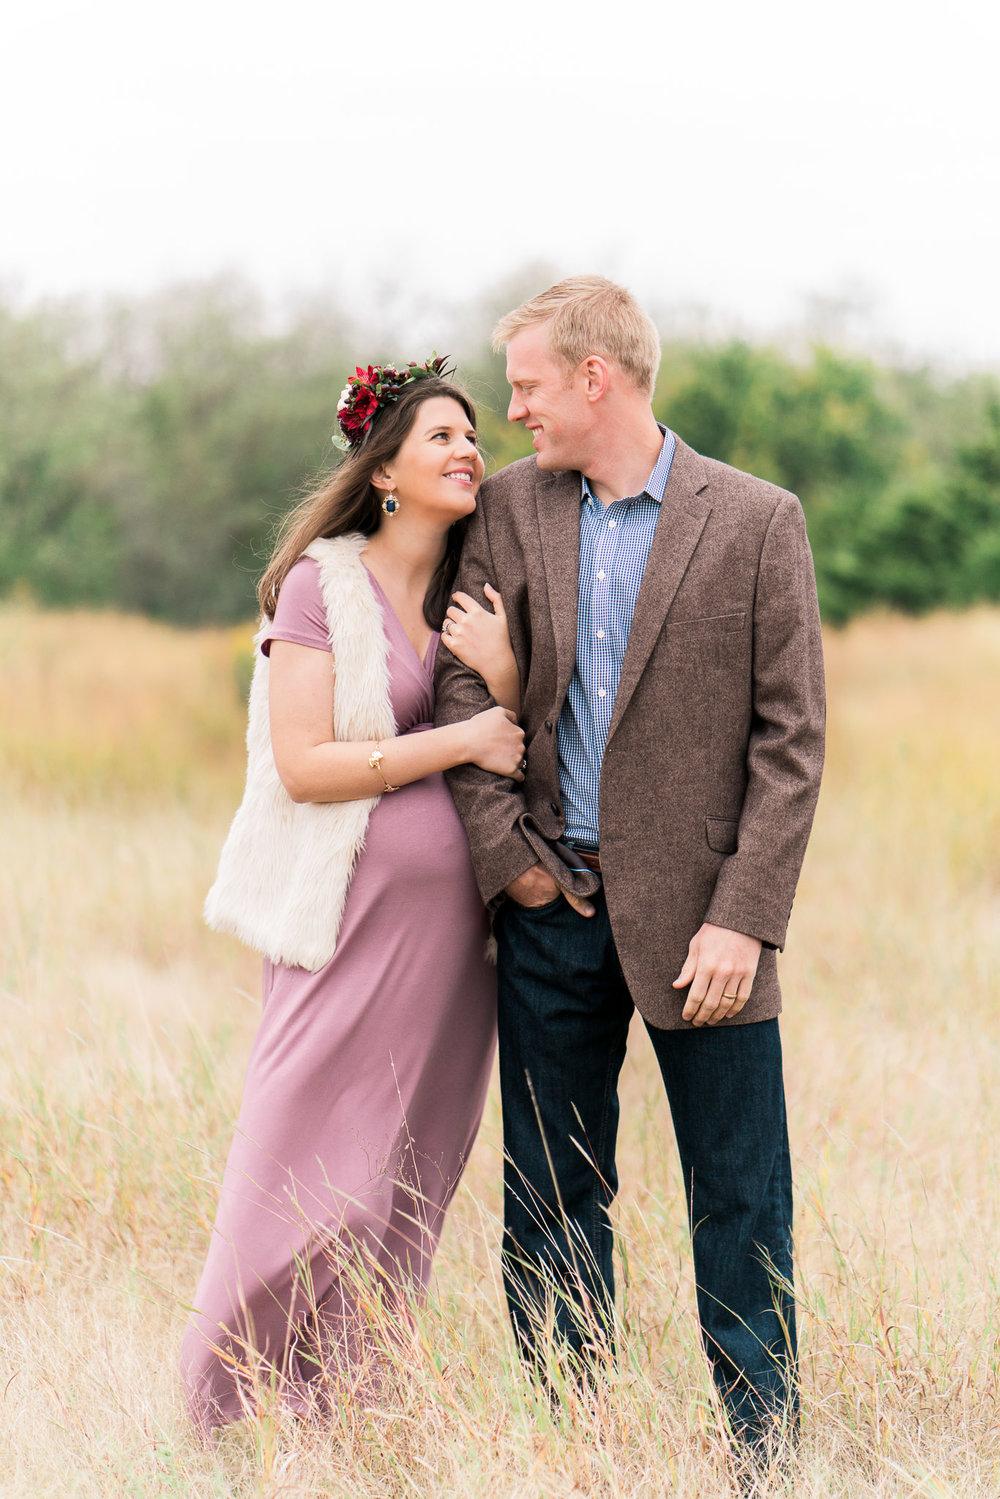 Lizanne-Andrew-Maternity-Kate-Bernard-Photography-Web-19.jpg